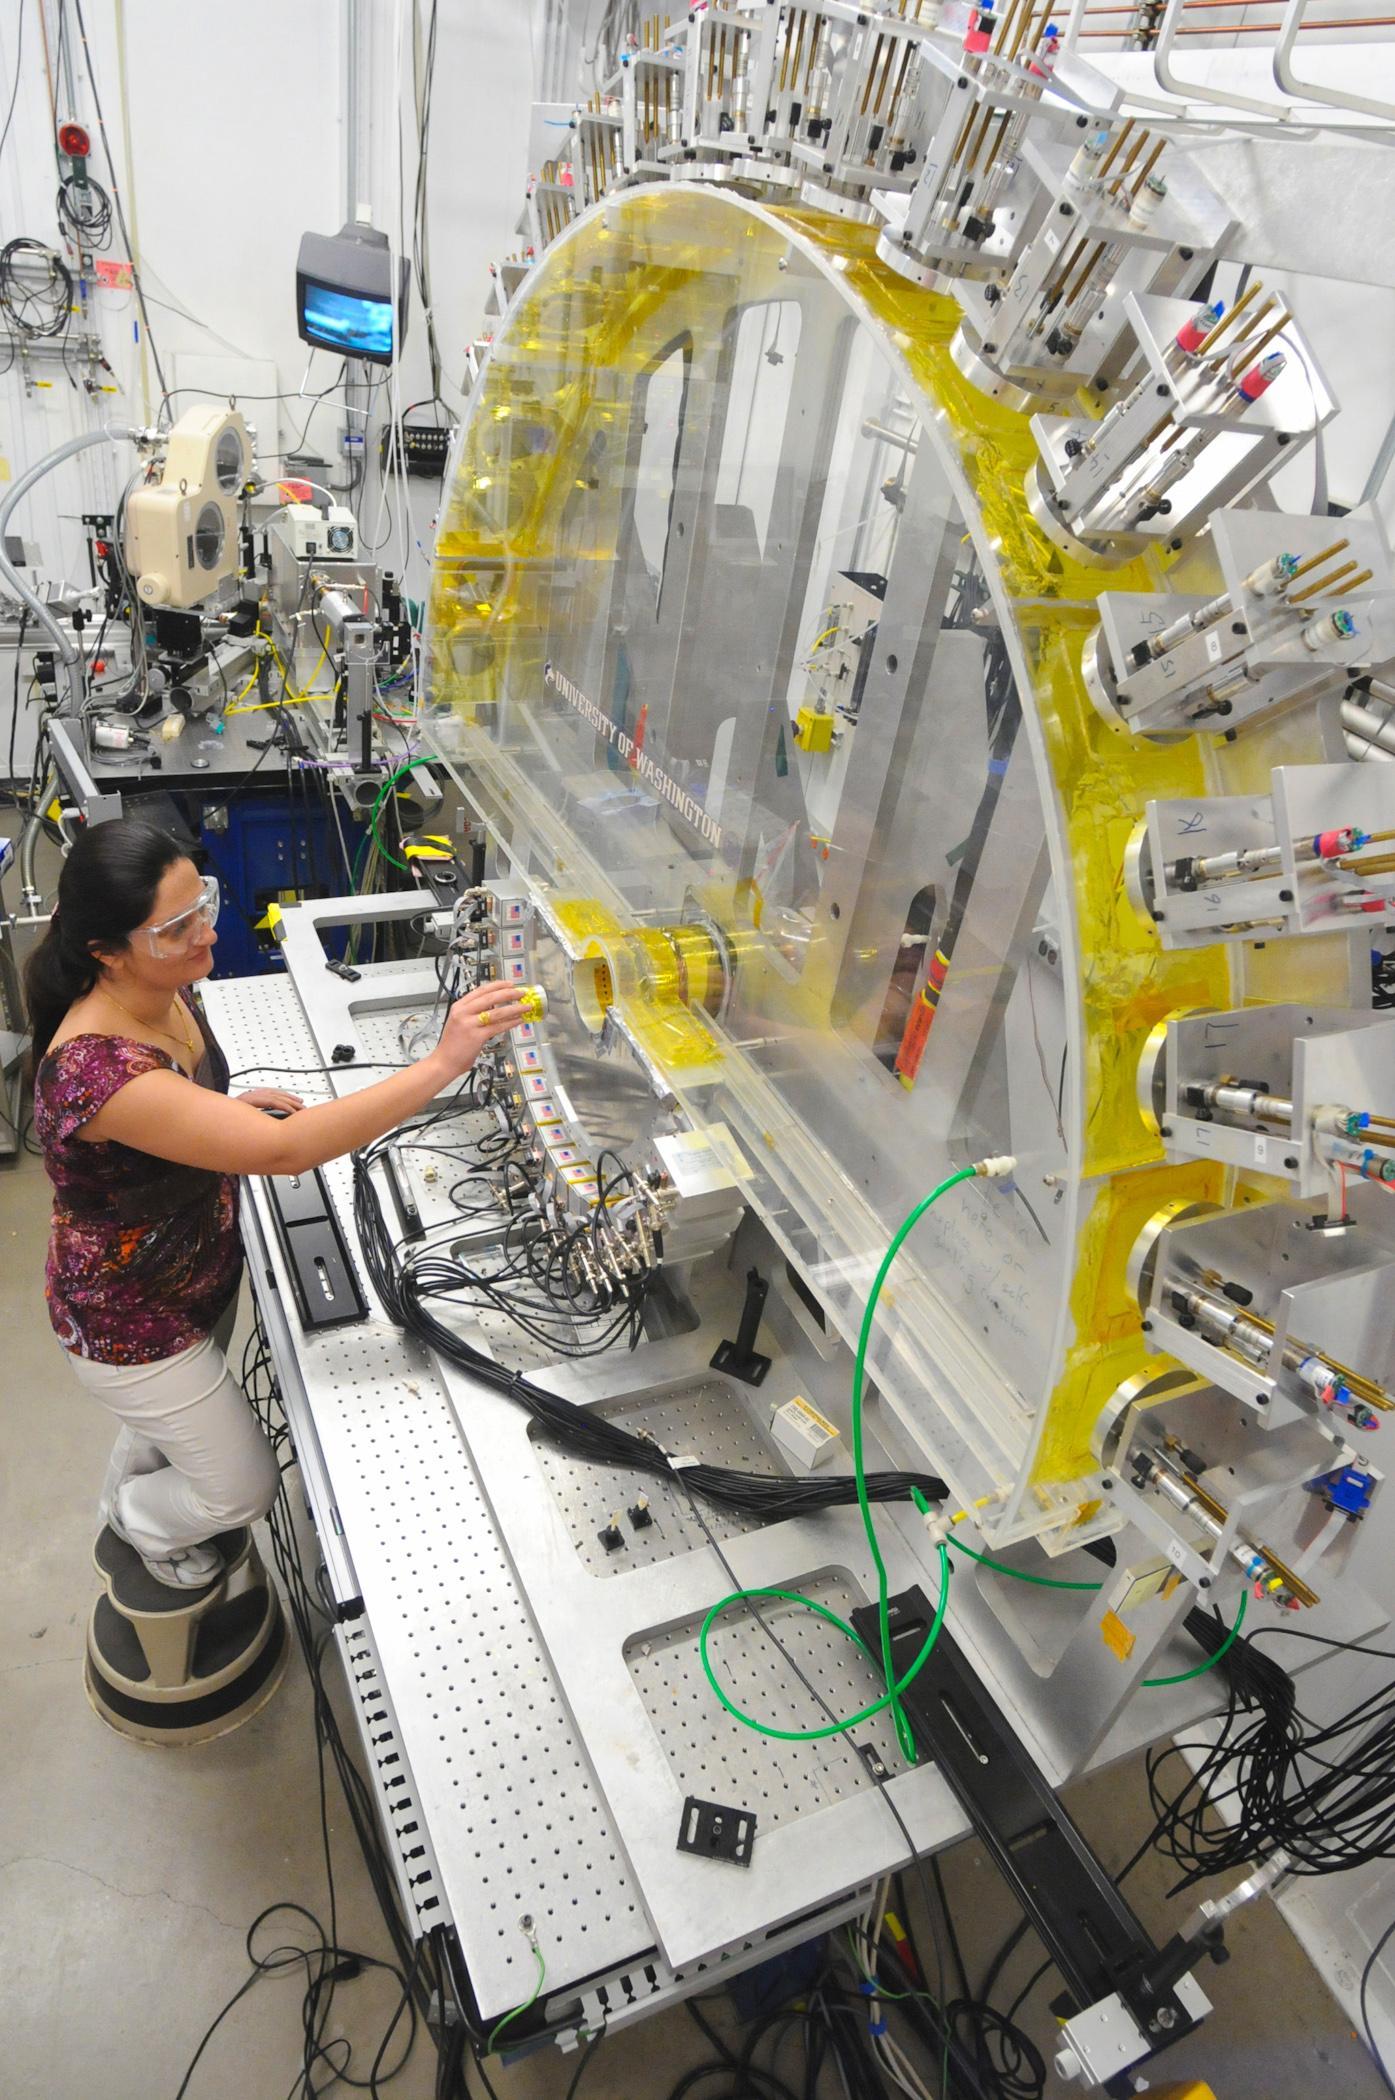 At Argonne National Laboratory